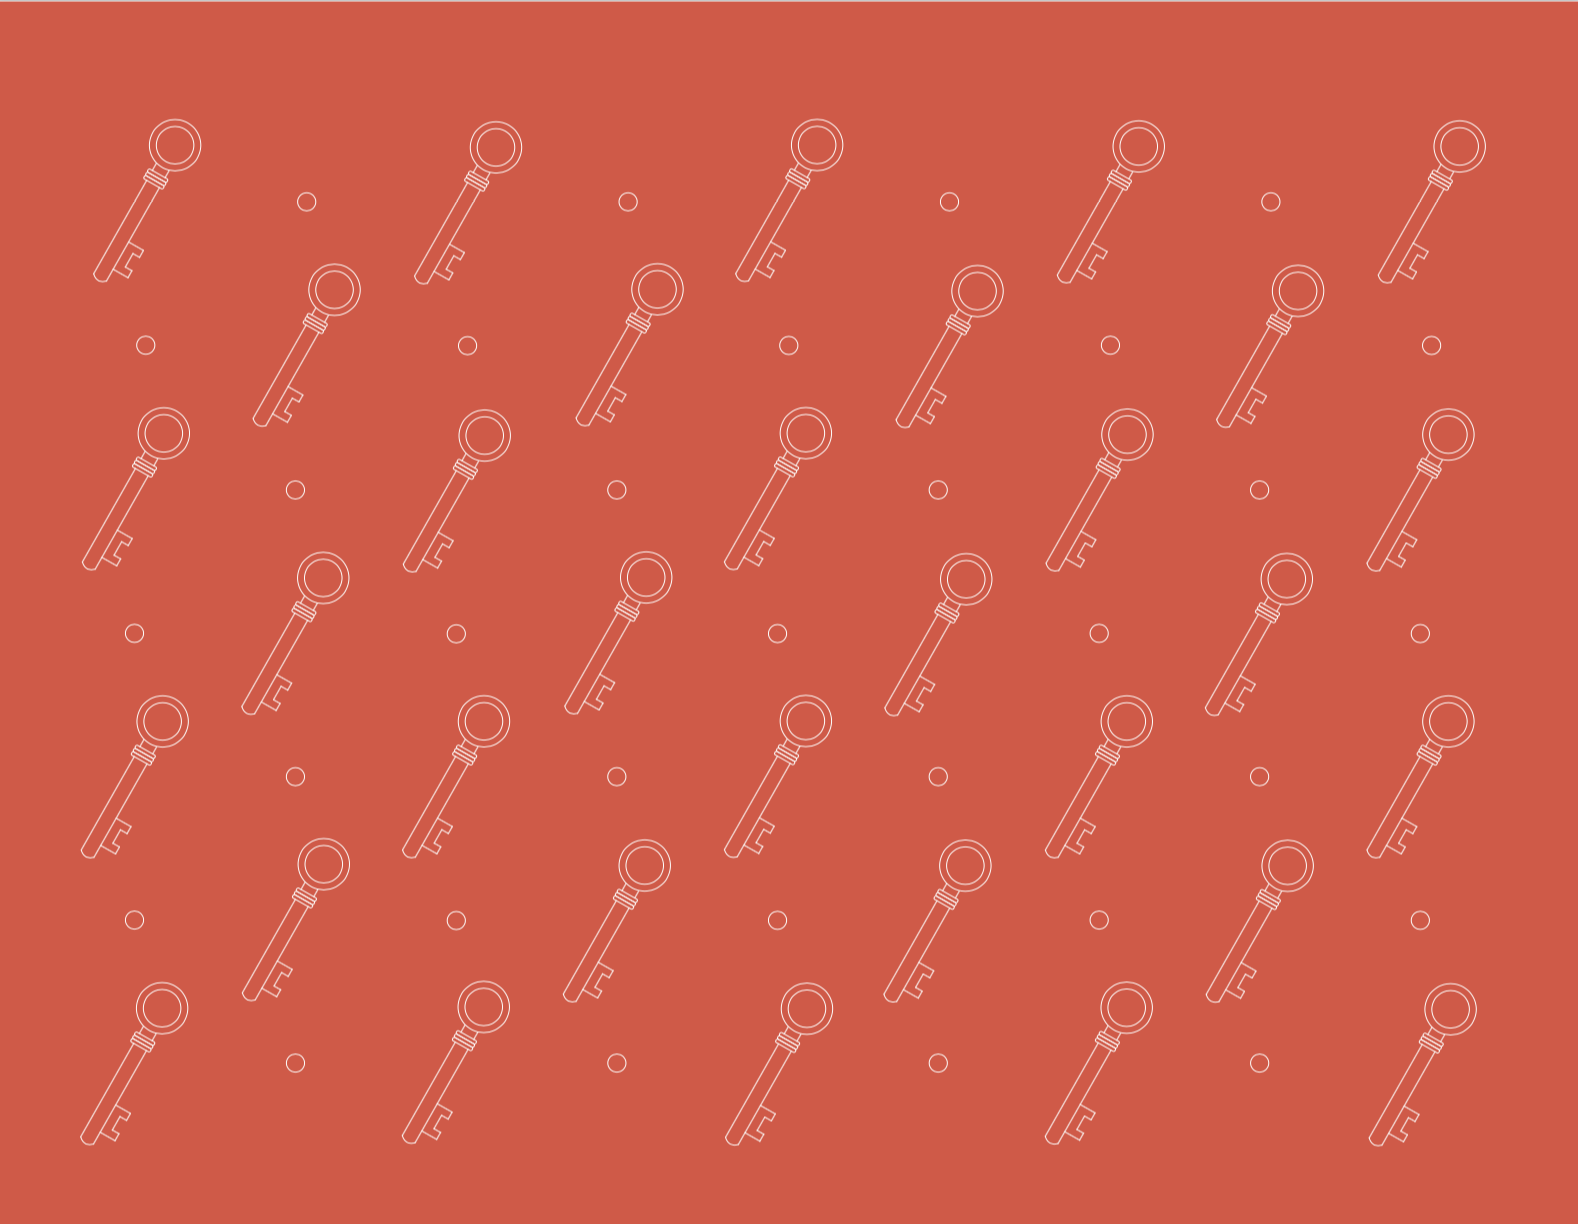 visual elements : key pattern